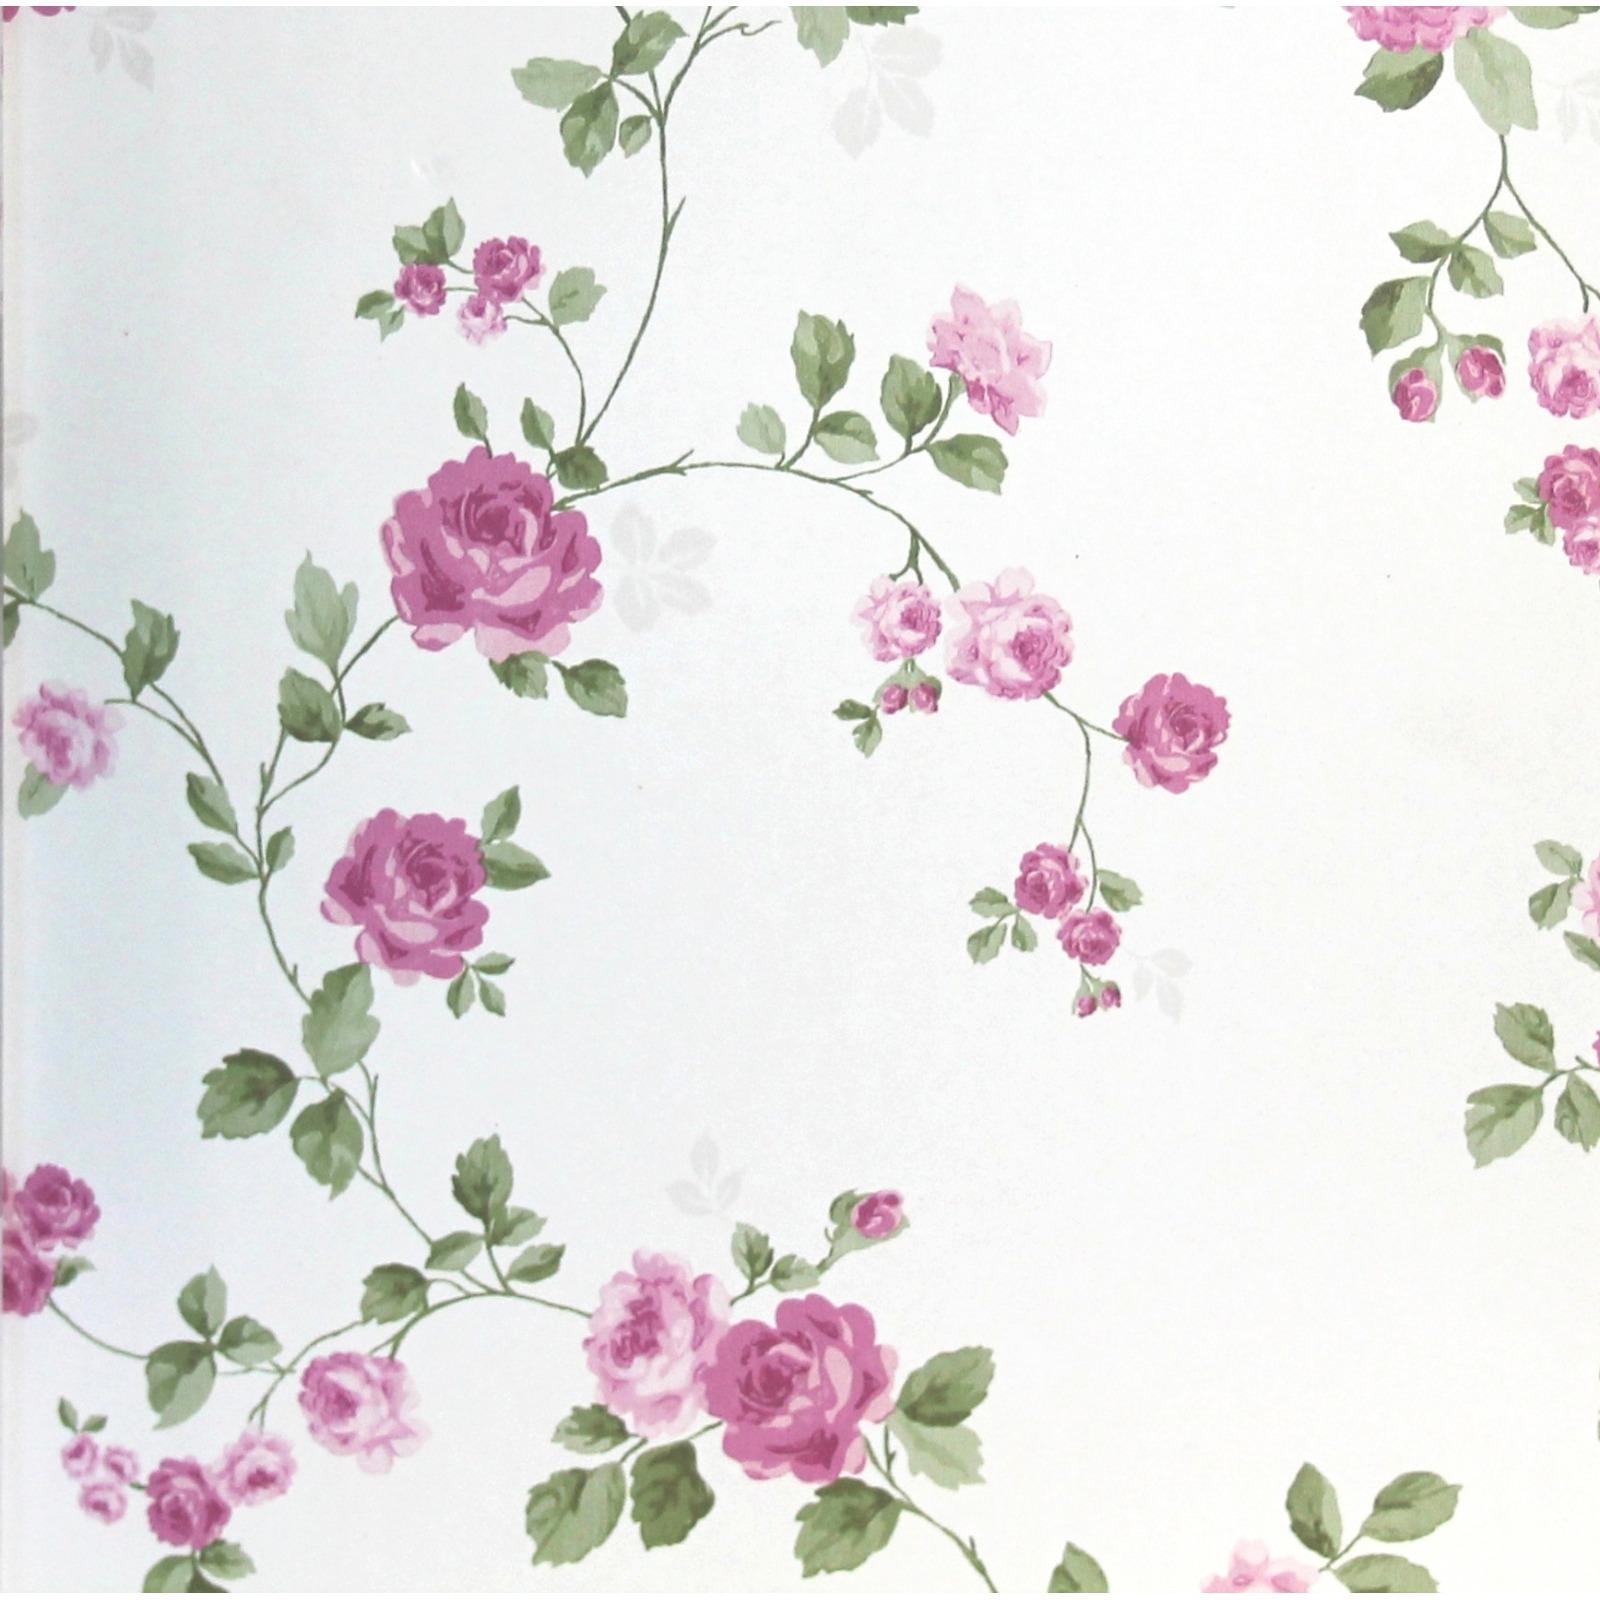 Carta Da Parati Vinilica Per Cucina carta da parati con le rose – cartilla